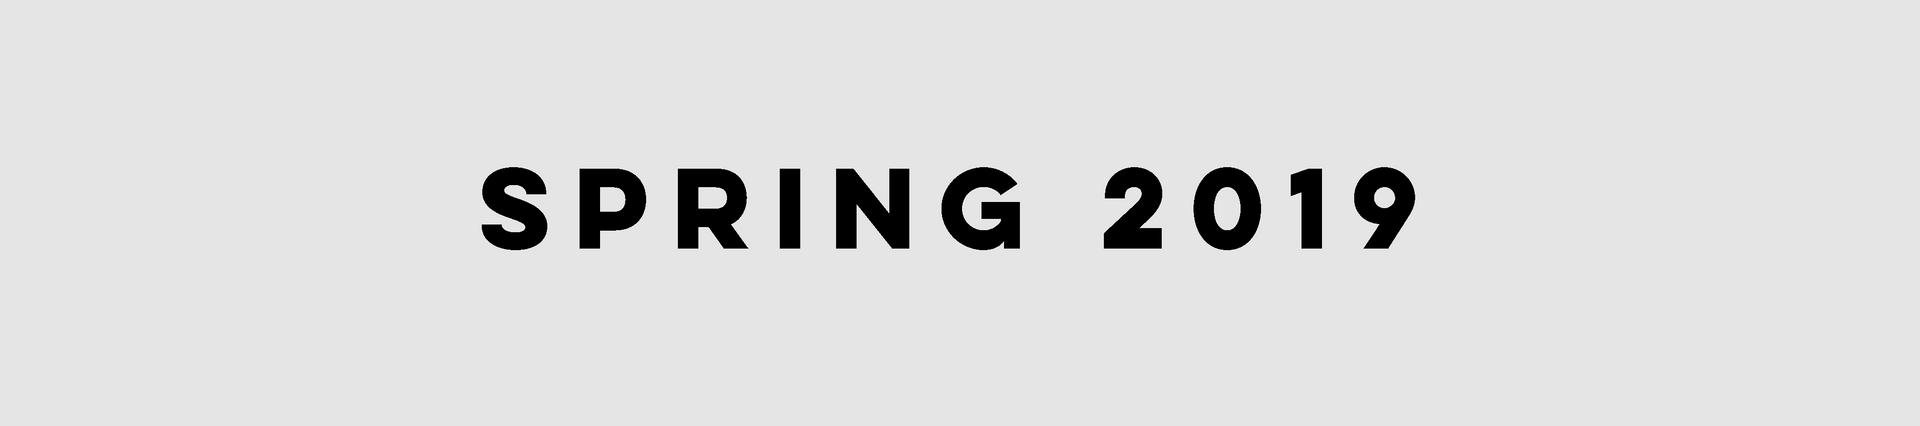 Seraphin Spring 2019